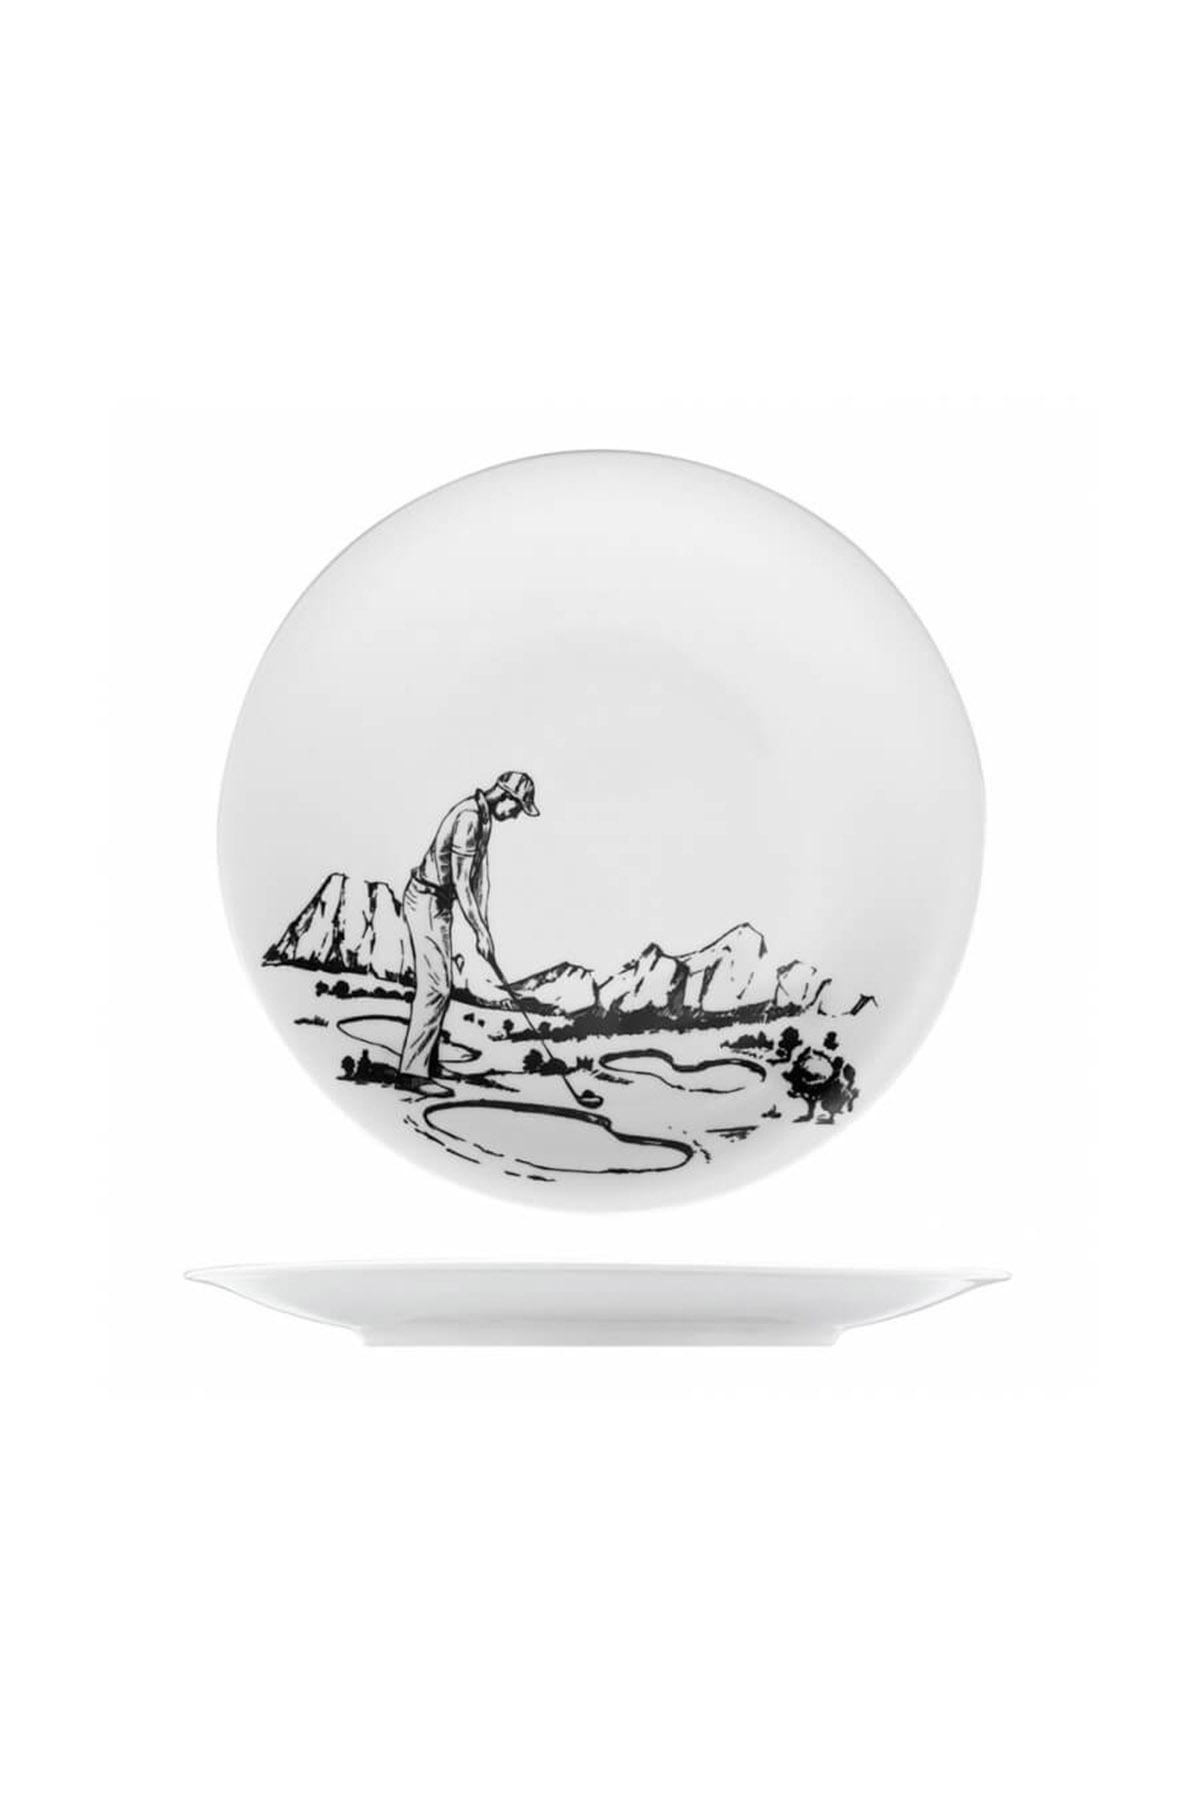 KÜTAHYA PORSELEN - Kütahya Porselen Centilmen Serisi Pasta Tabağı Golf